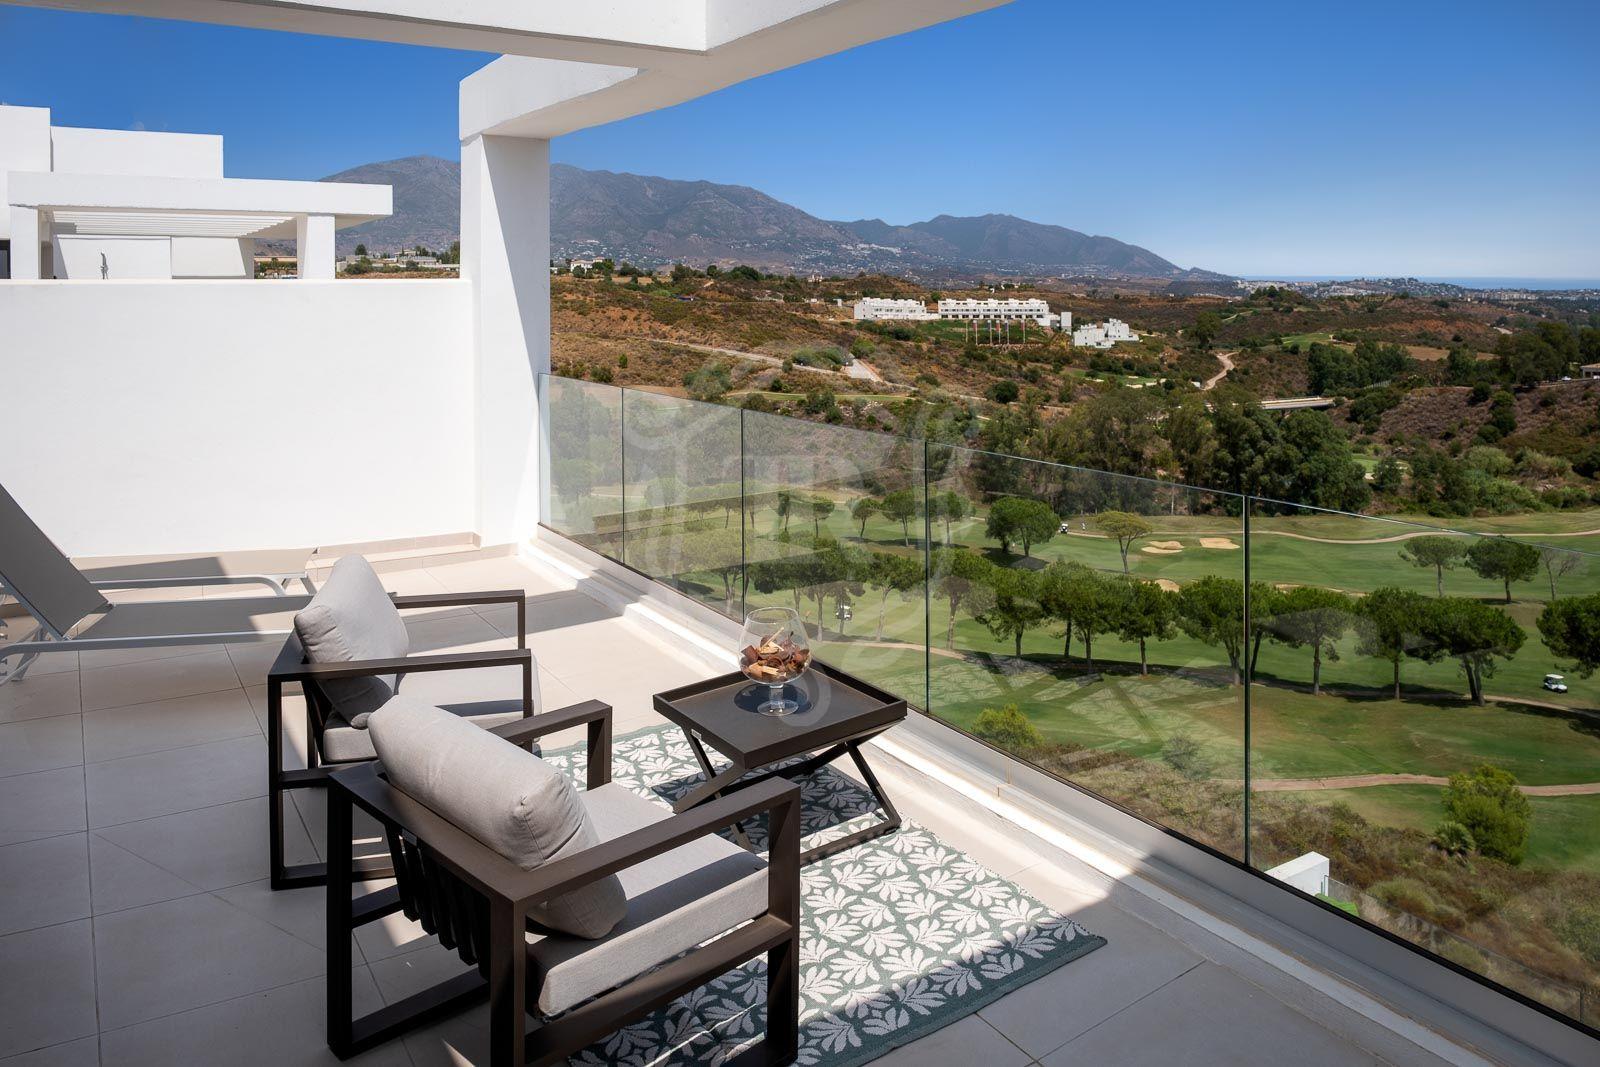 Frontline golf penthouse in Mijas - La Cala Fairways